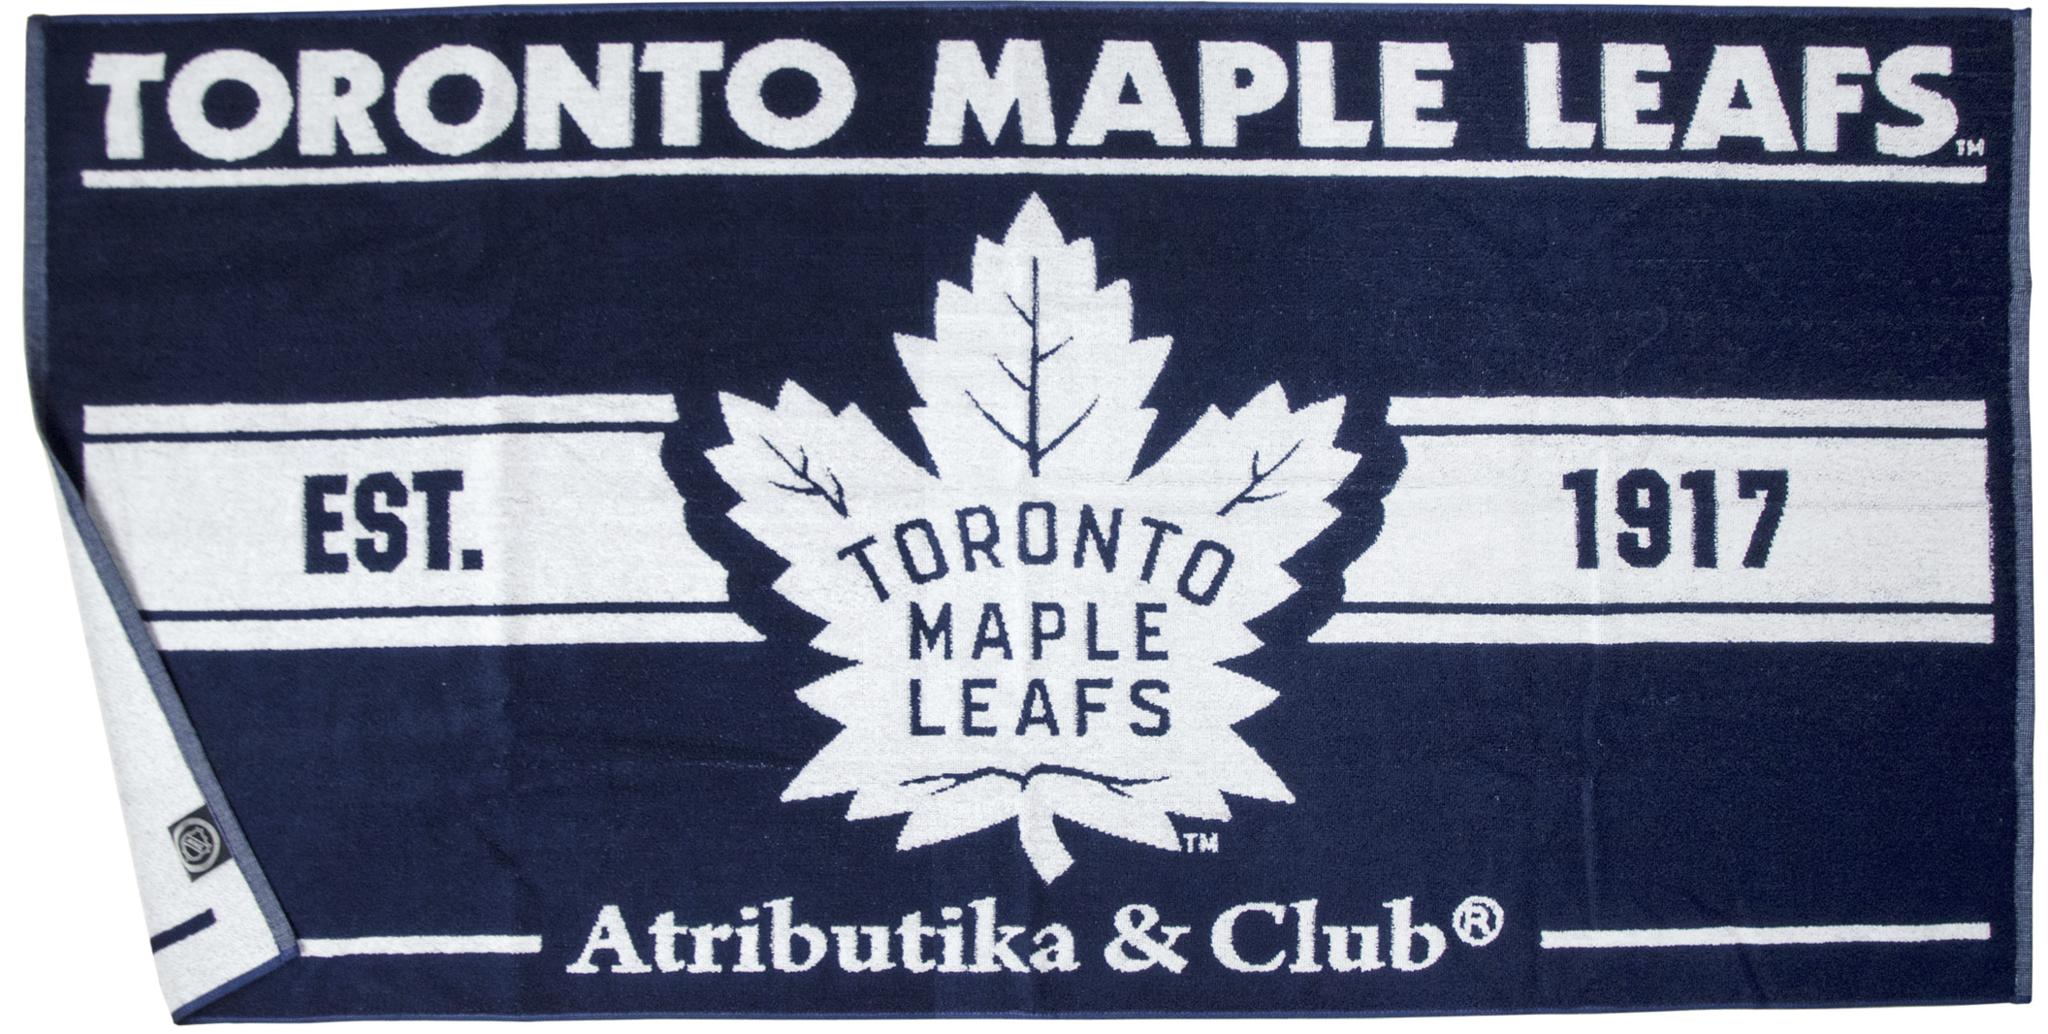 Полотенце NHL Toronto Maple Leafs est. 1917